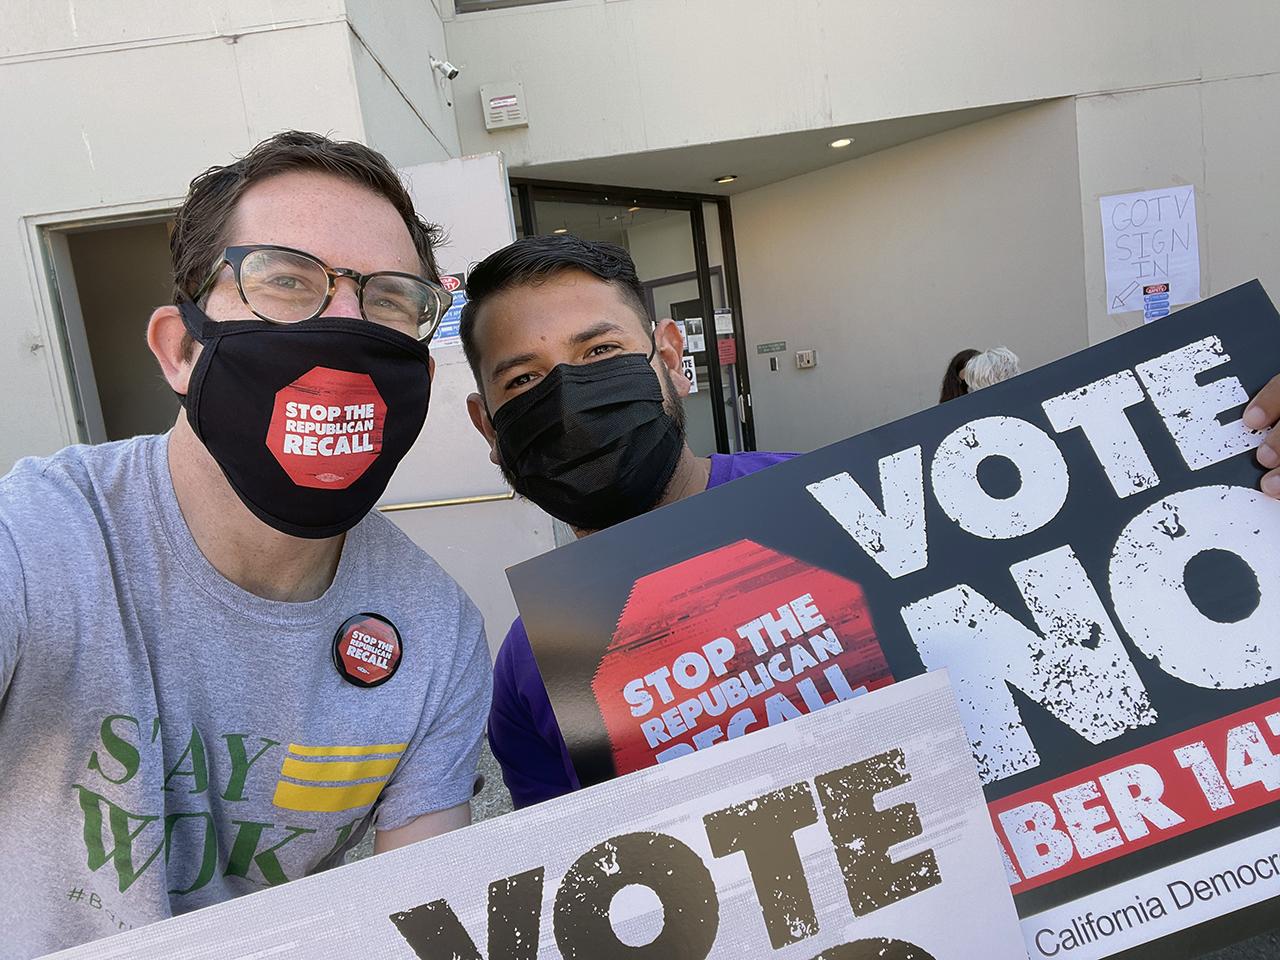 Jewish Dems celebrate Newsom's victory in recall election – J. - The Jewish News of Northern California